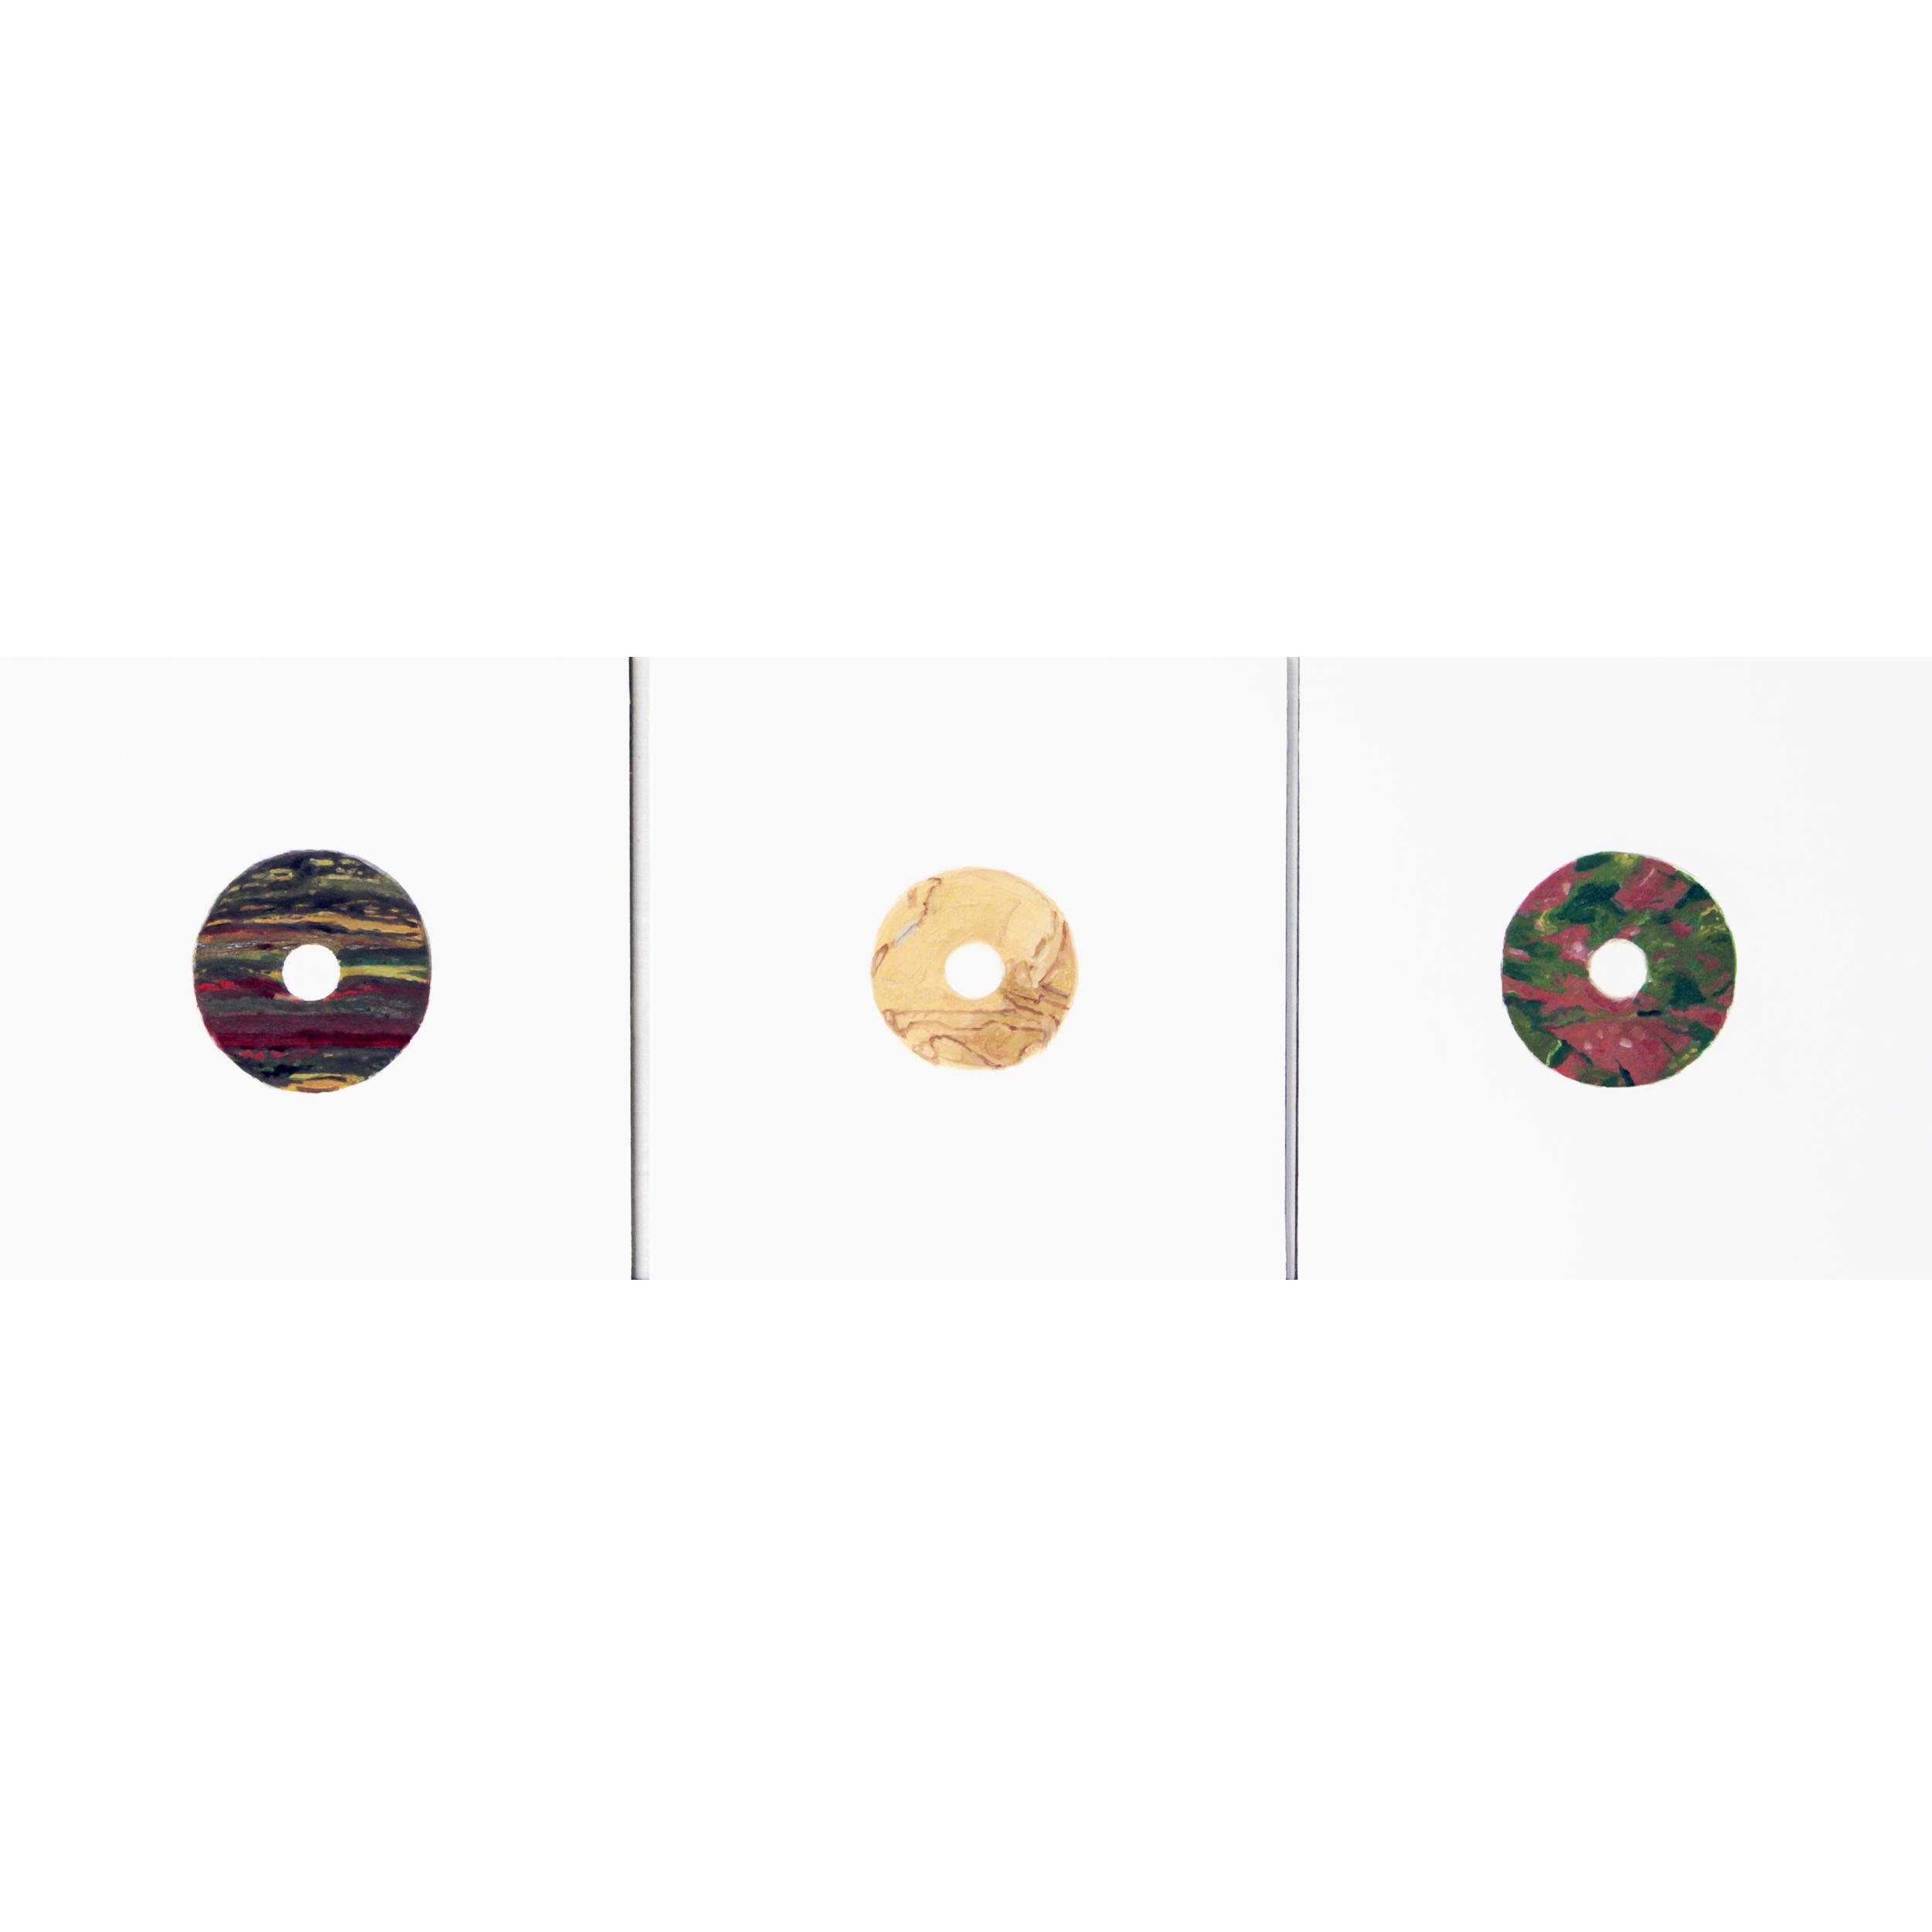 Stone Disks